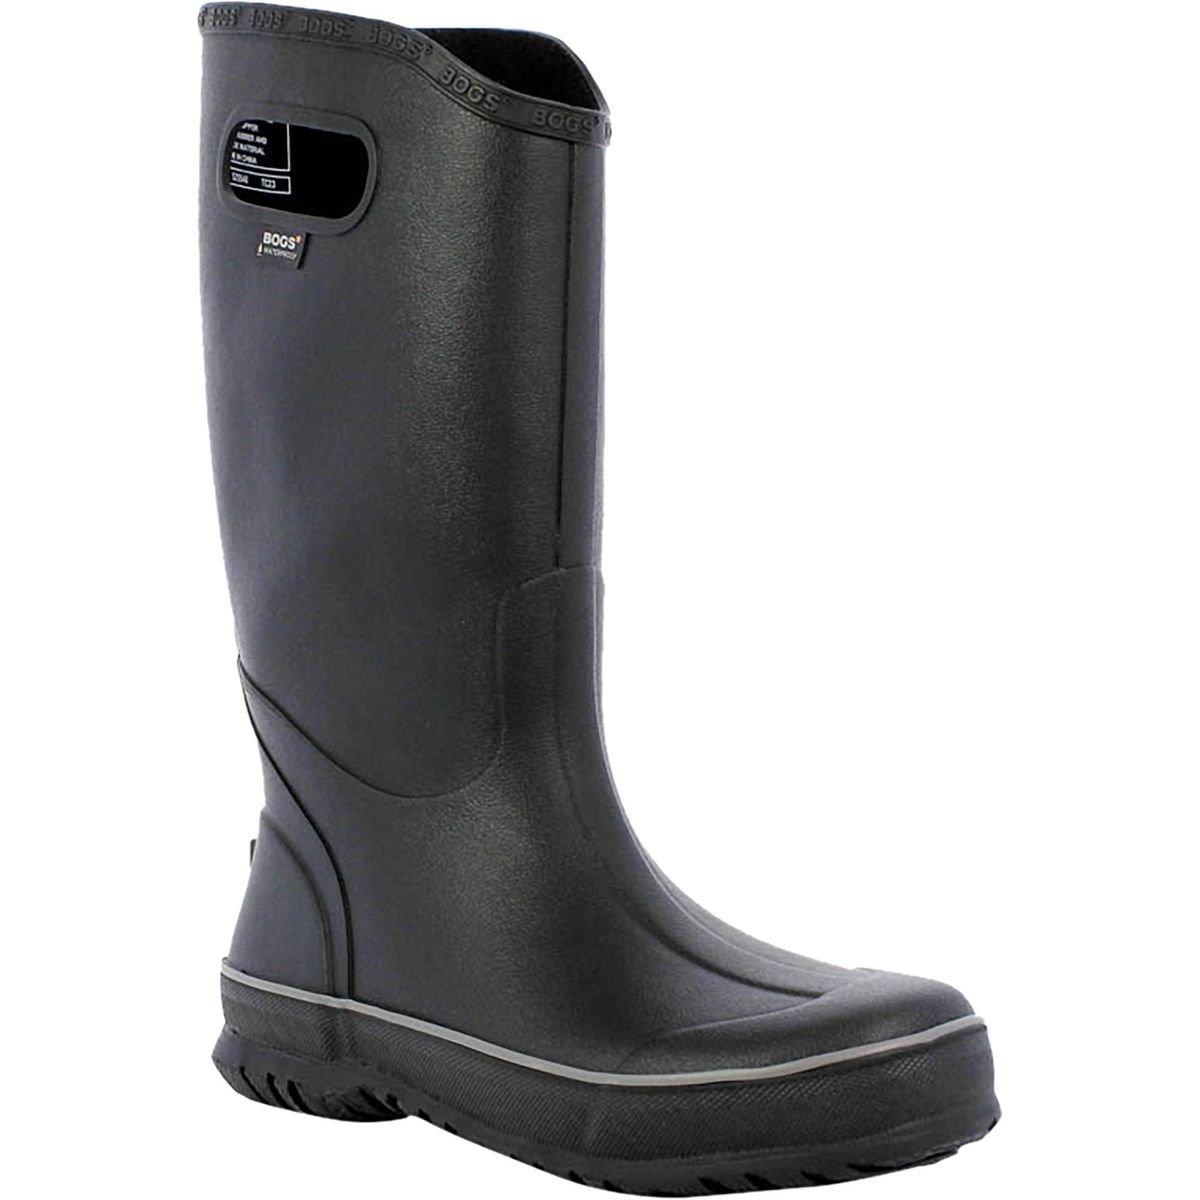 Bogs Men's Waterproof Rubber Rain Boot, Black, 12 D(M) US